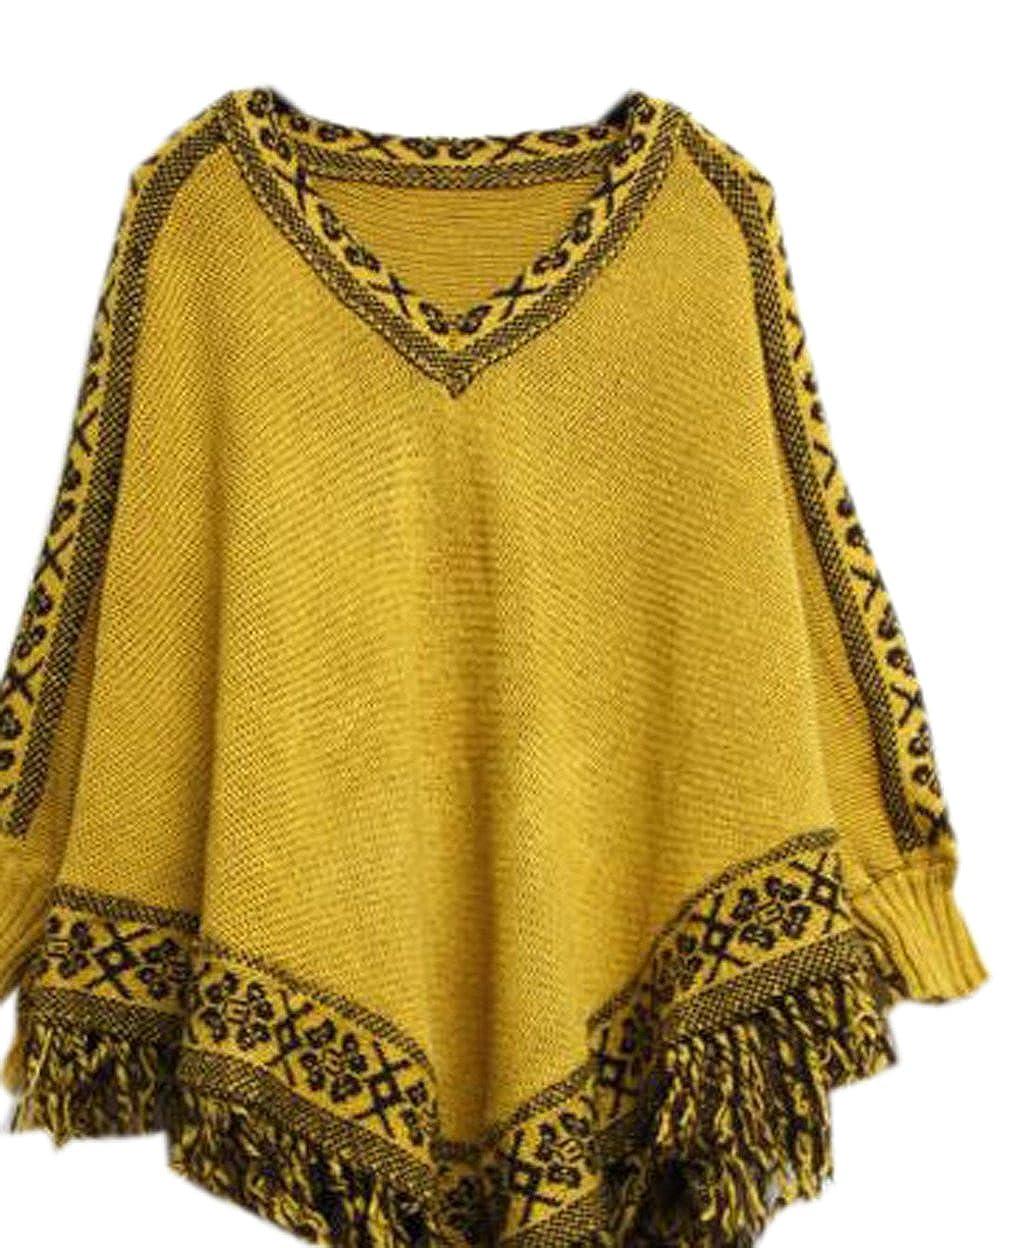 La vogue Damen Gestrickter Poncho Winter Pullover Umhang Cape